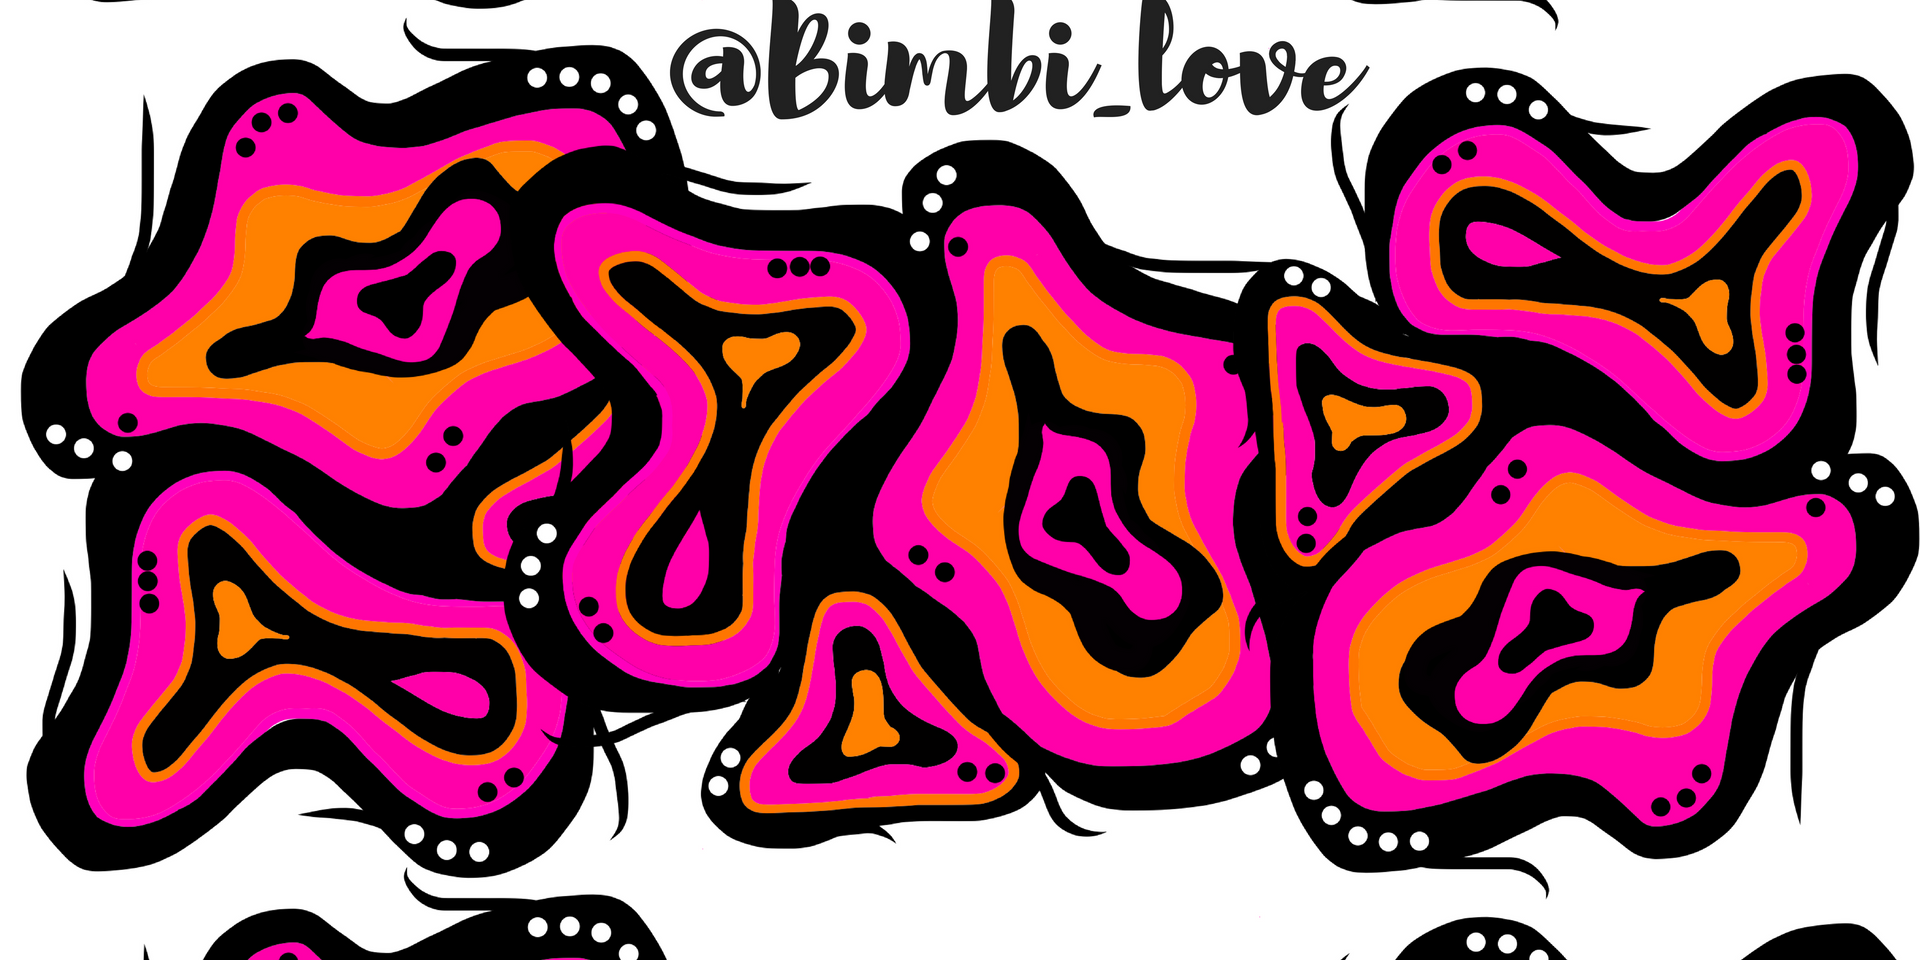 _Bimbi_love.png